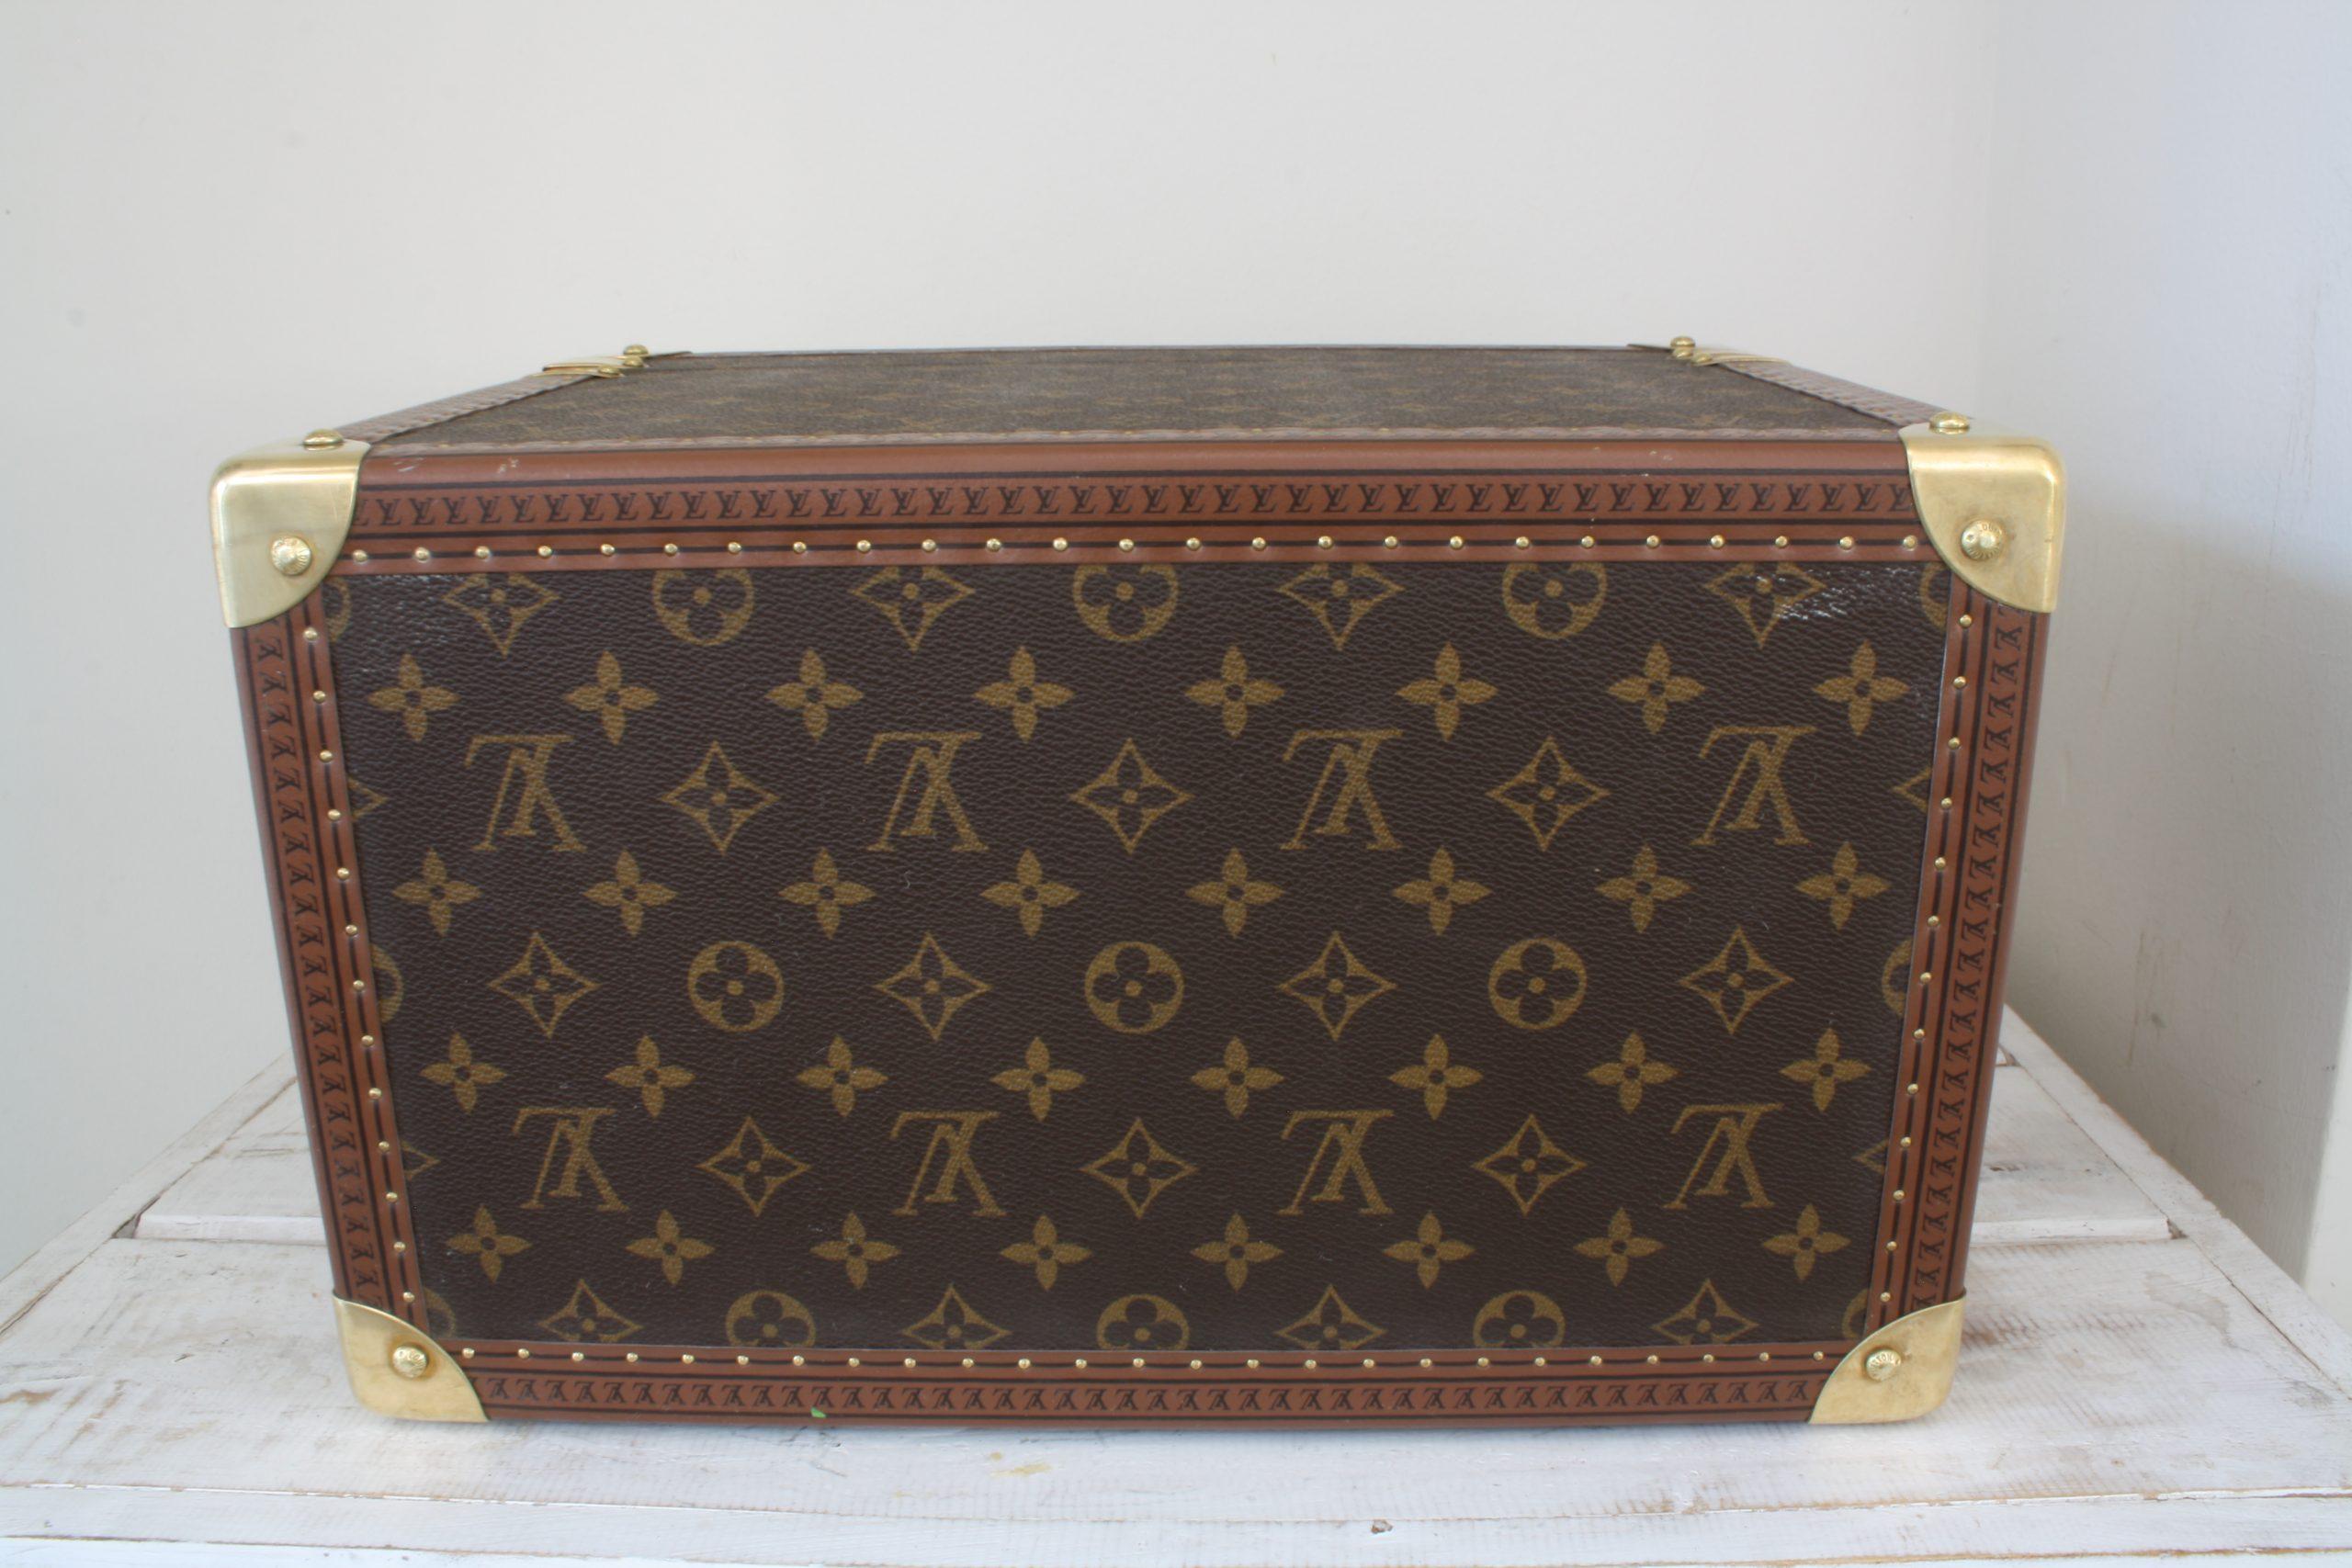 vintage-louis-vuitton-large-vanity-case-bottom-side